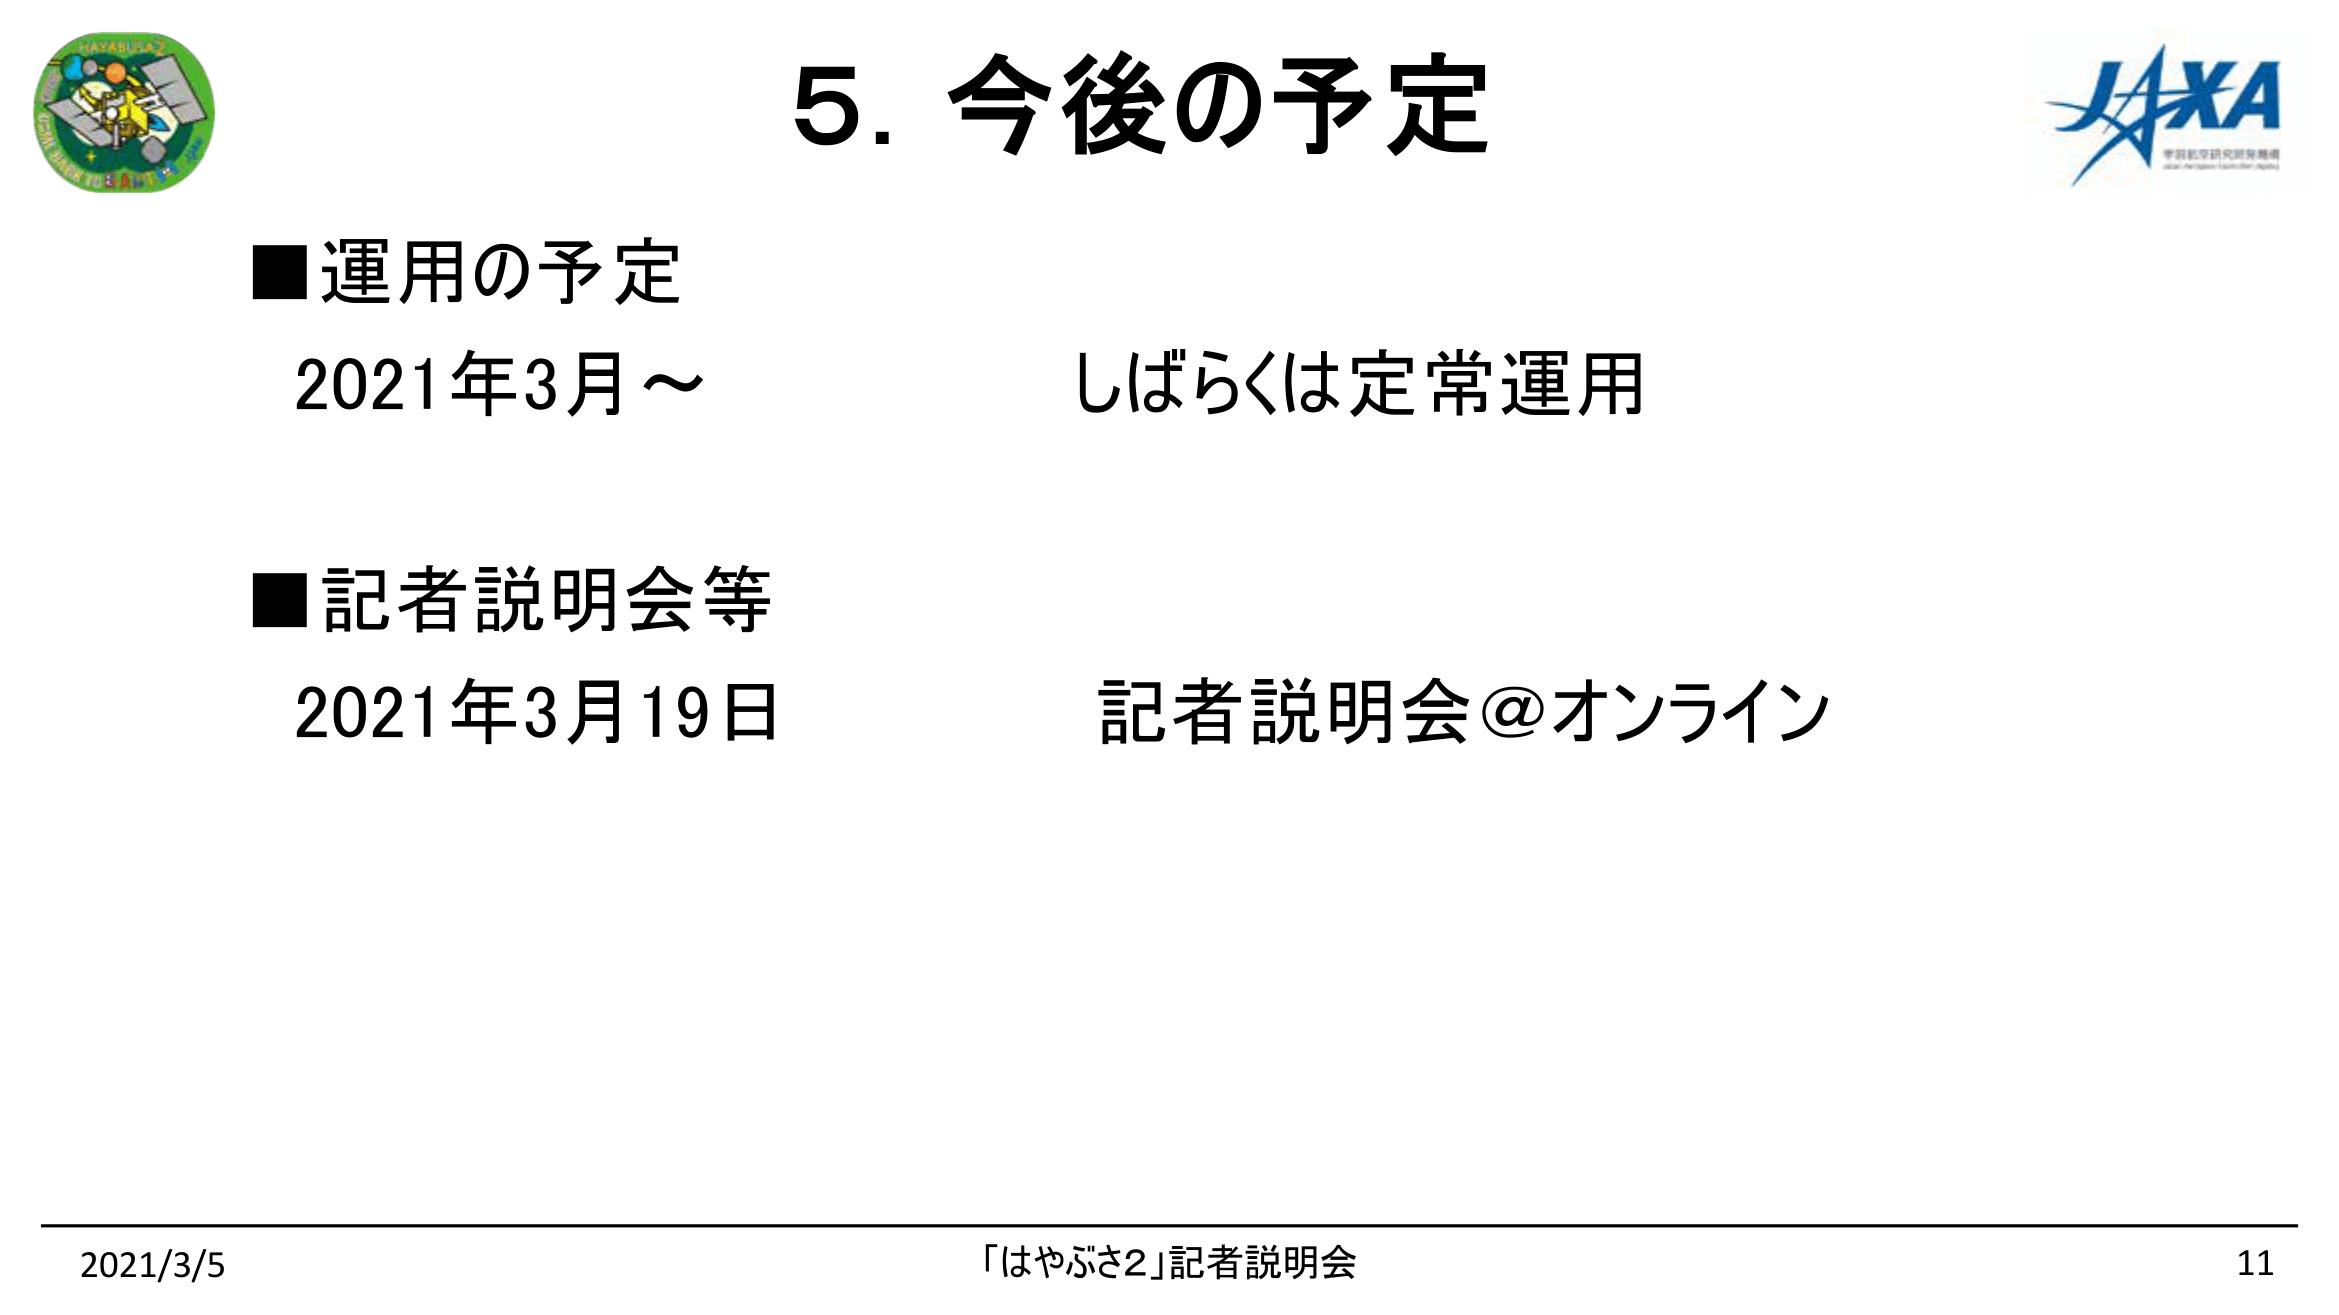 f:id:Imamura:20210305134203p:plain